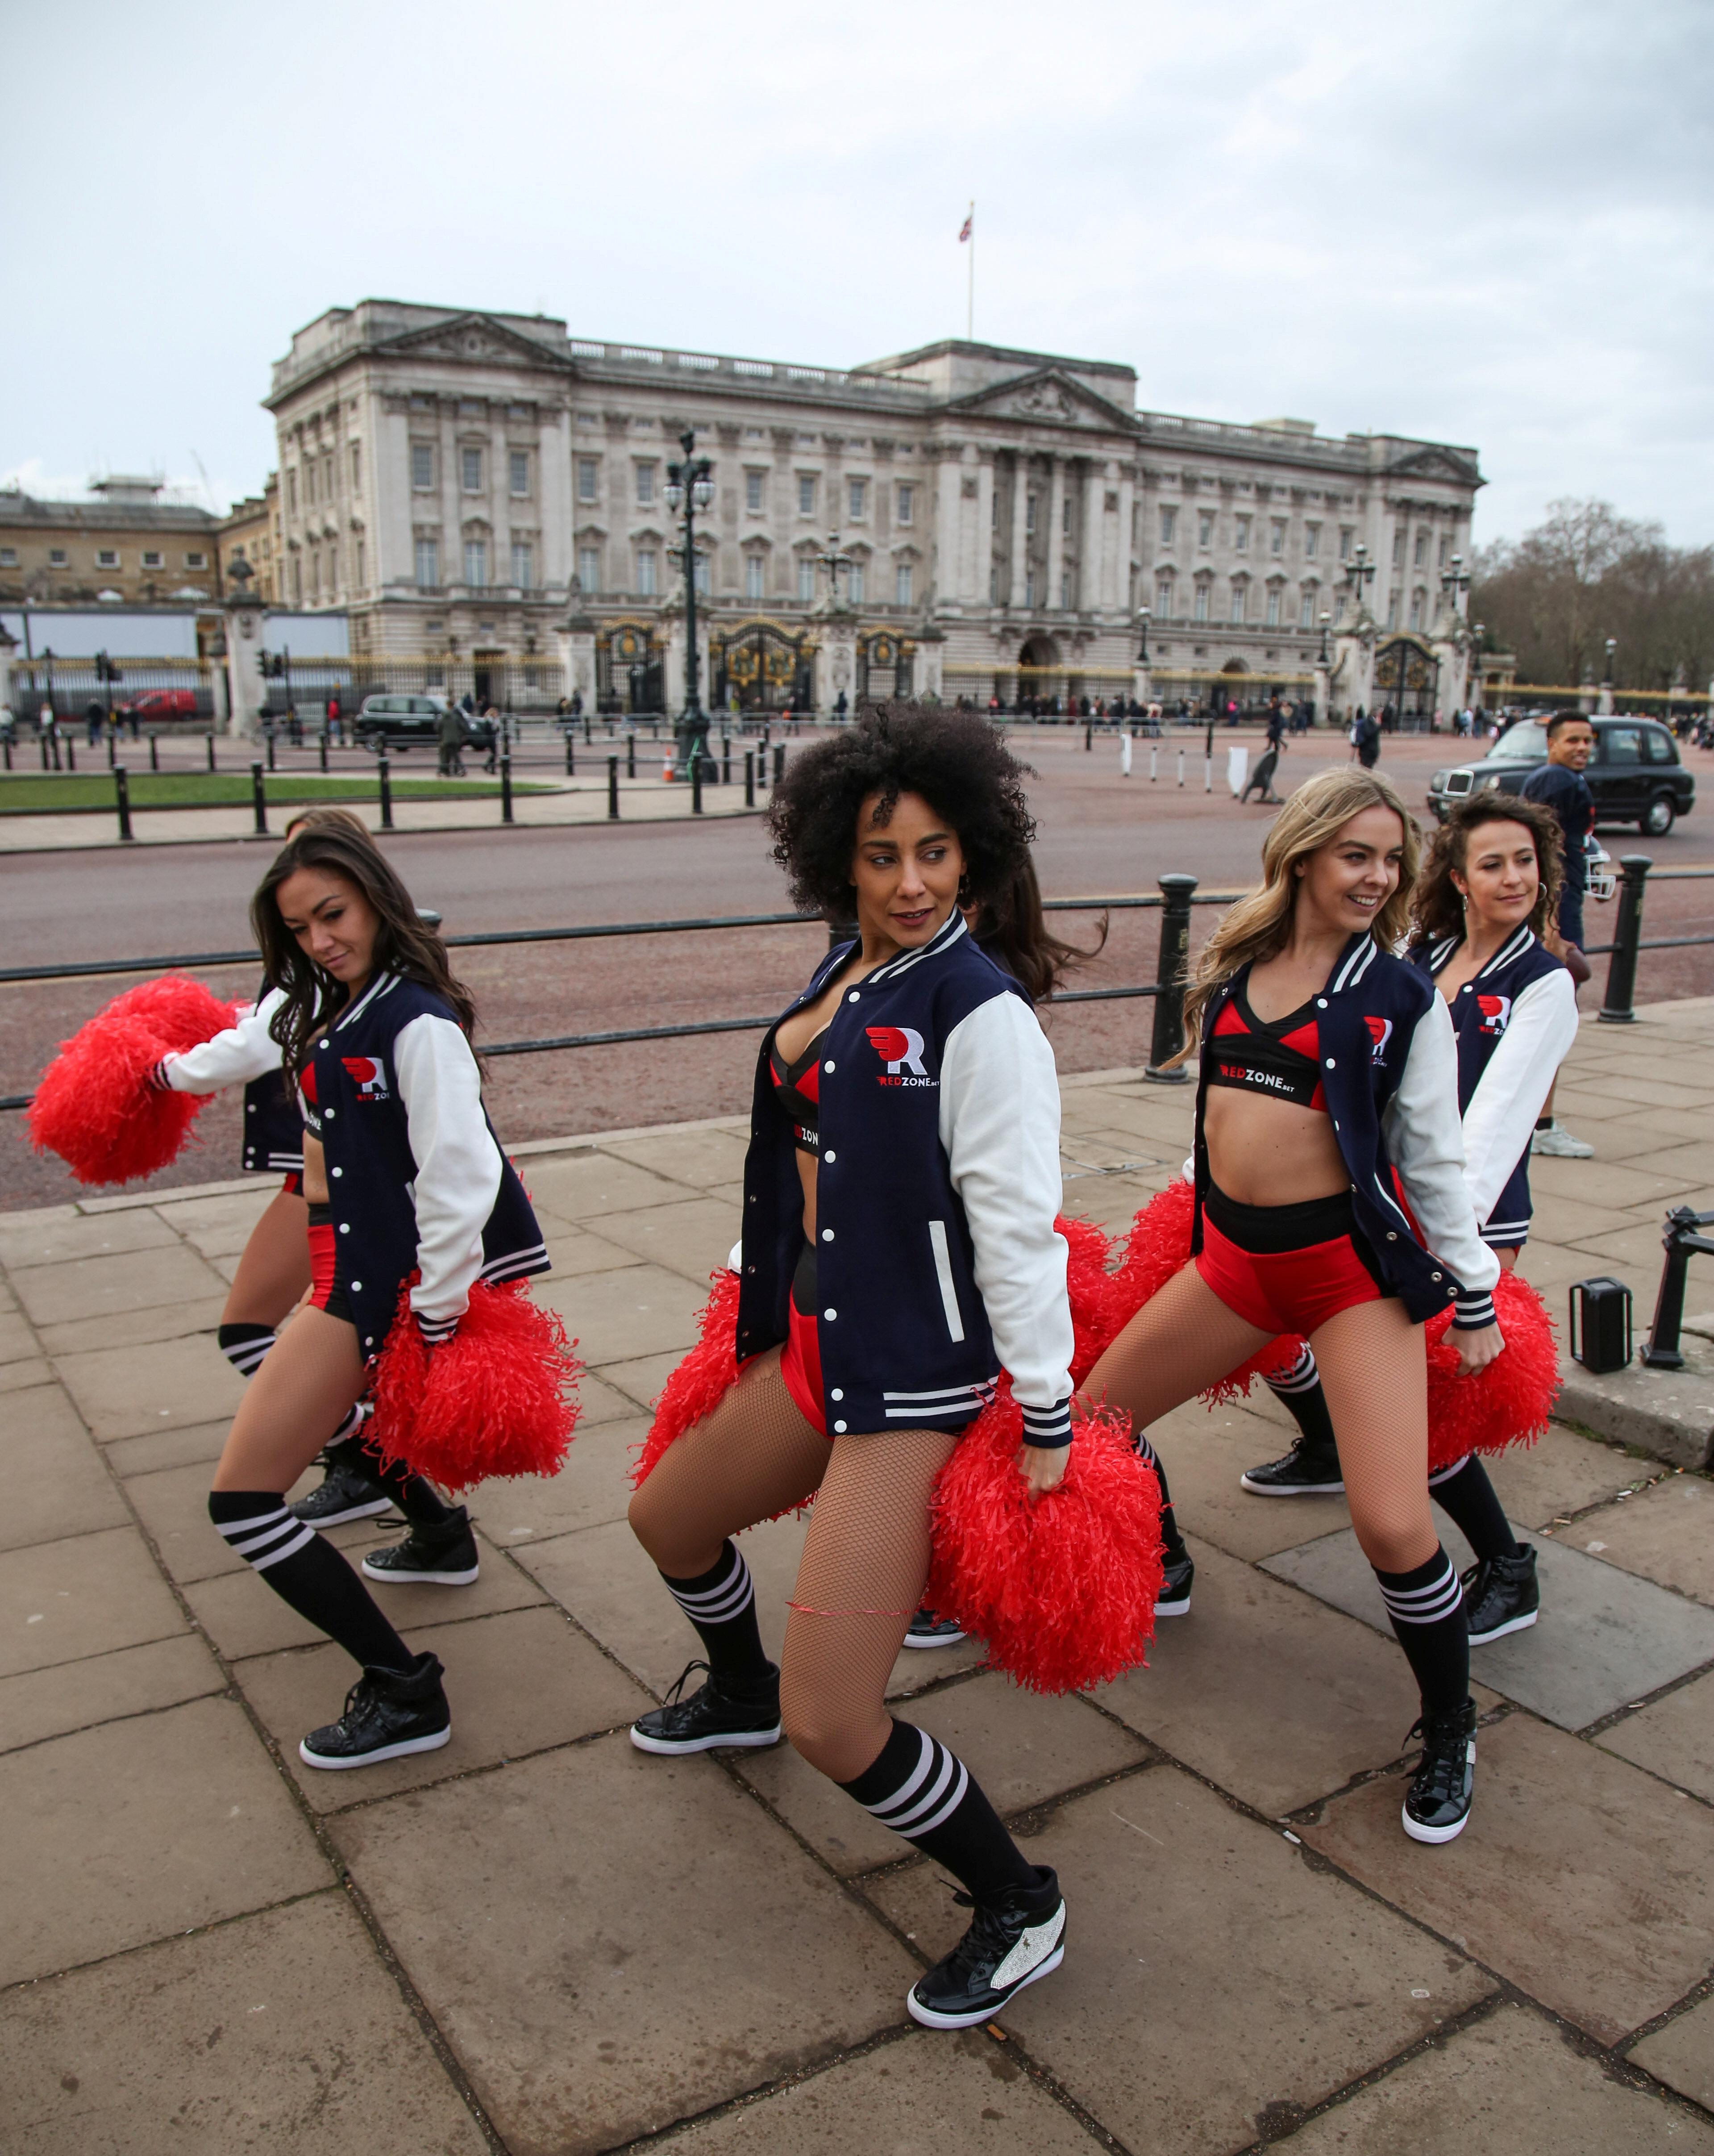 Cheerleaders promote Sunday's Super Bowl in London